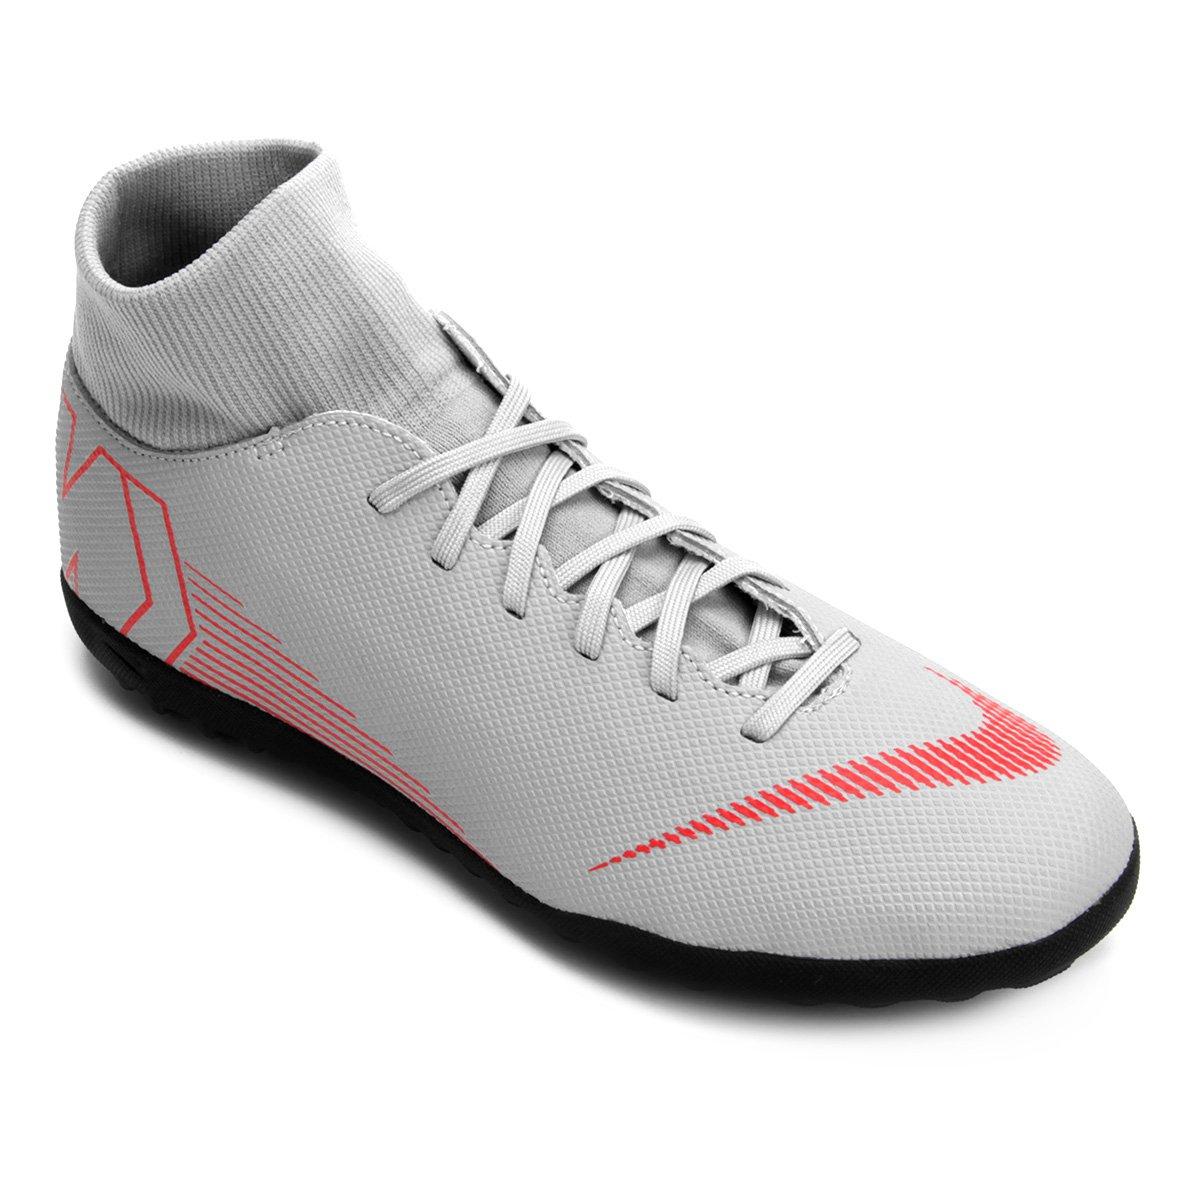 8256ff4d25 Chuteira Society Nike Mercurial Superfly 6 Club - Cinza - Compre ...